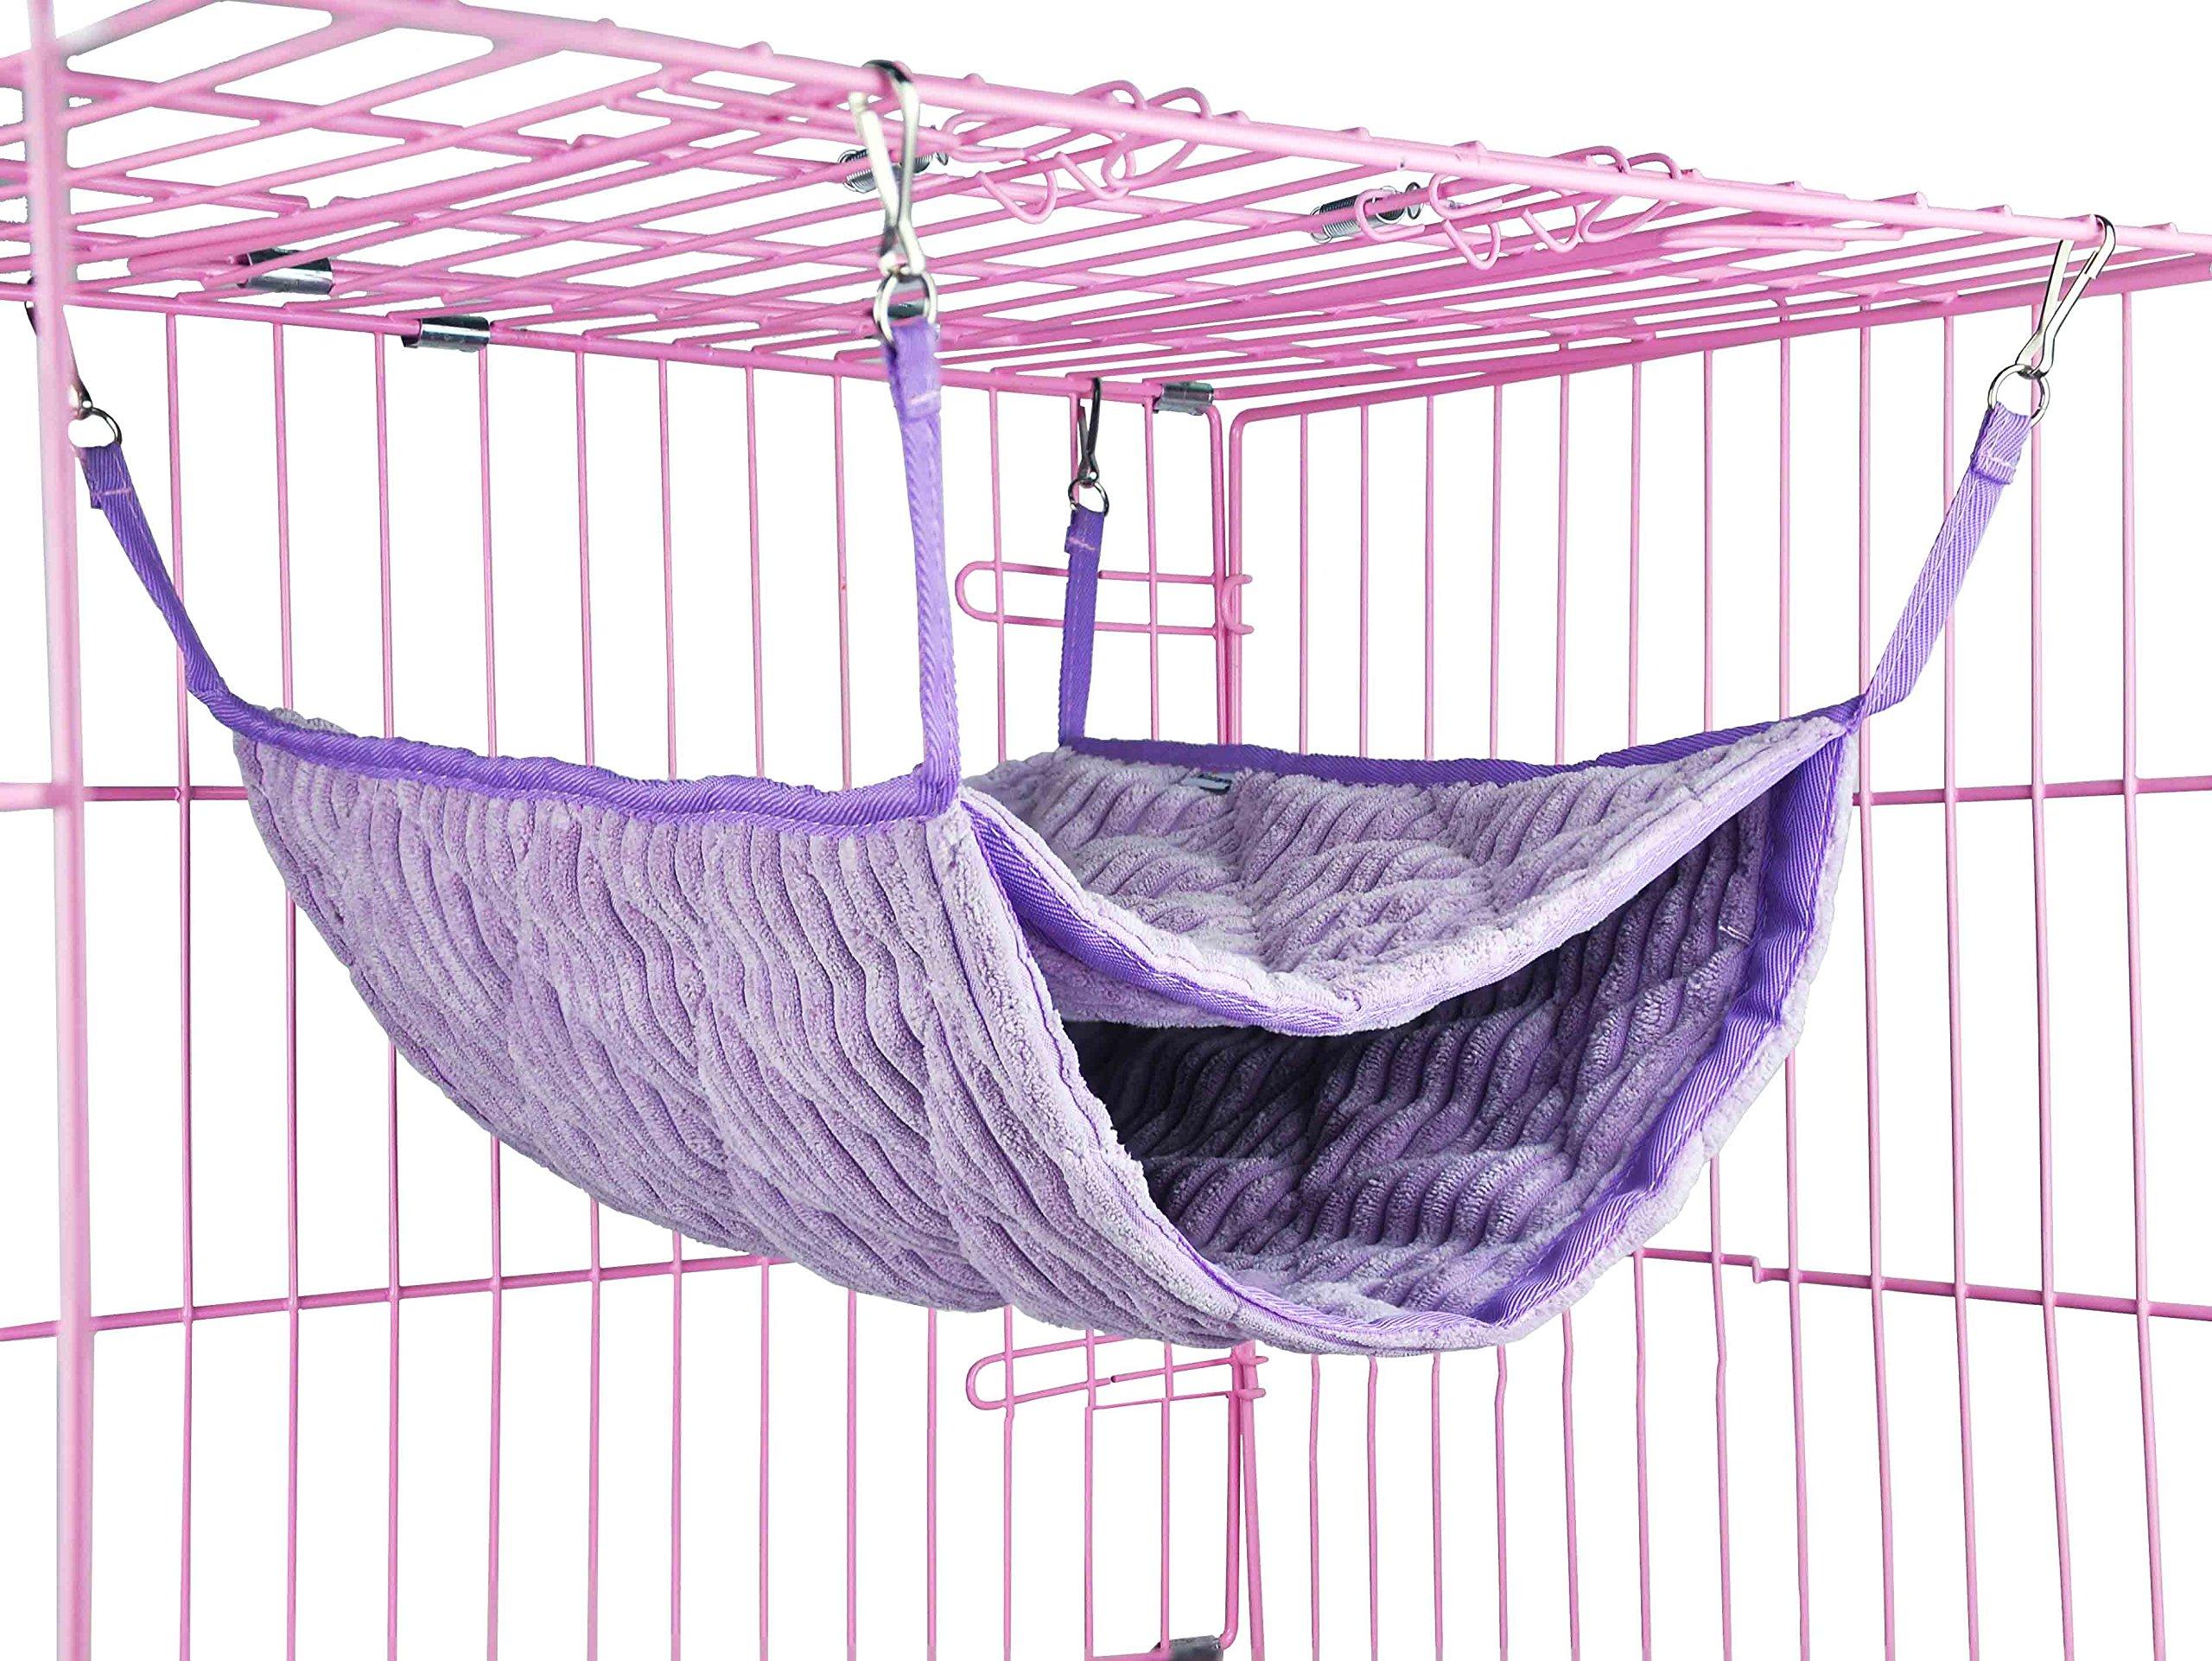 Niteangel Luxury Double Bunkbed Hammock, Fit 2 Adult Ferrets or 5 More Adult Rats (Purple) by Niteangel